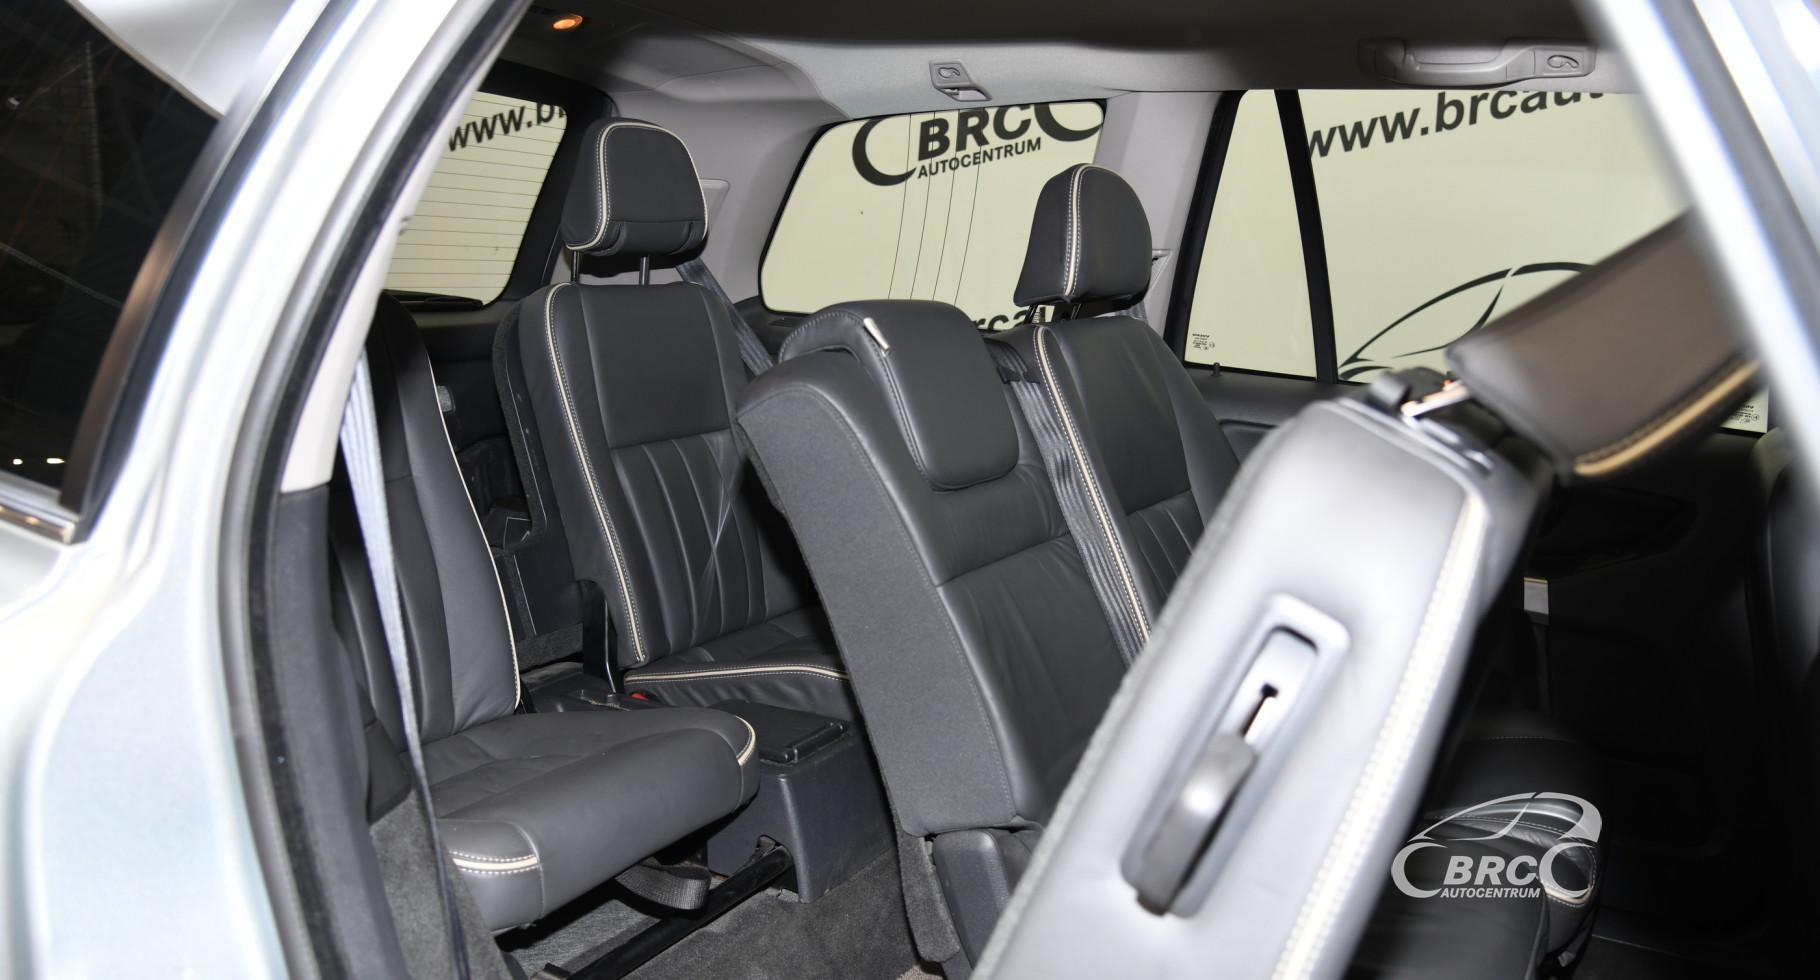 Volvo XC 90 2.4 D5 7 Seats Sips AWD Automatas